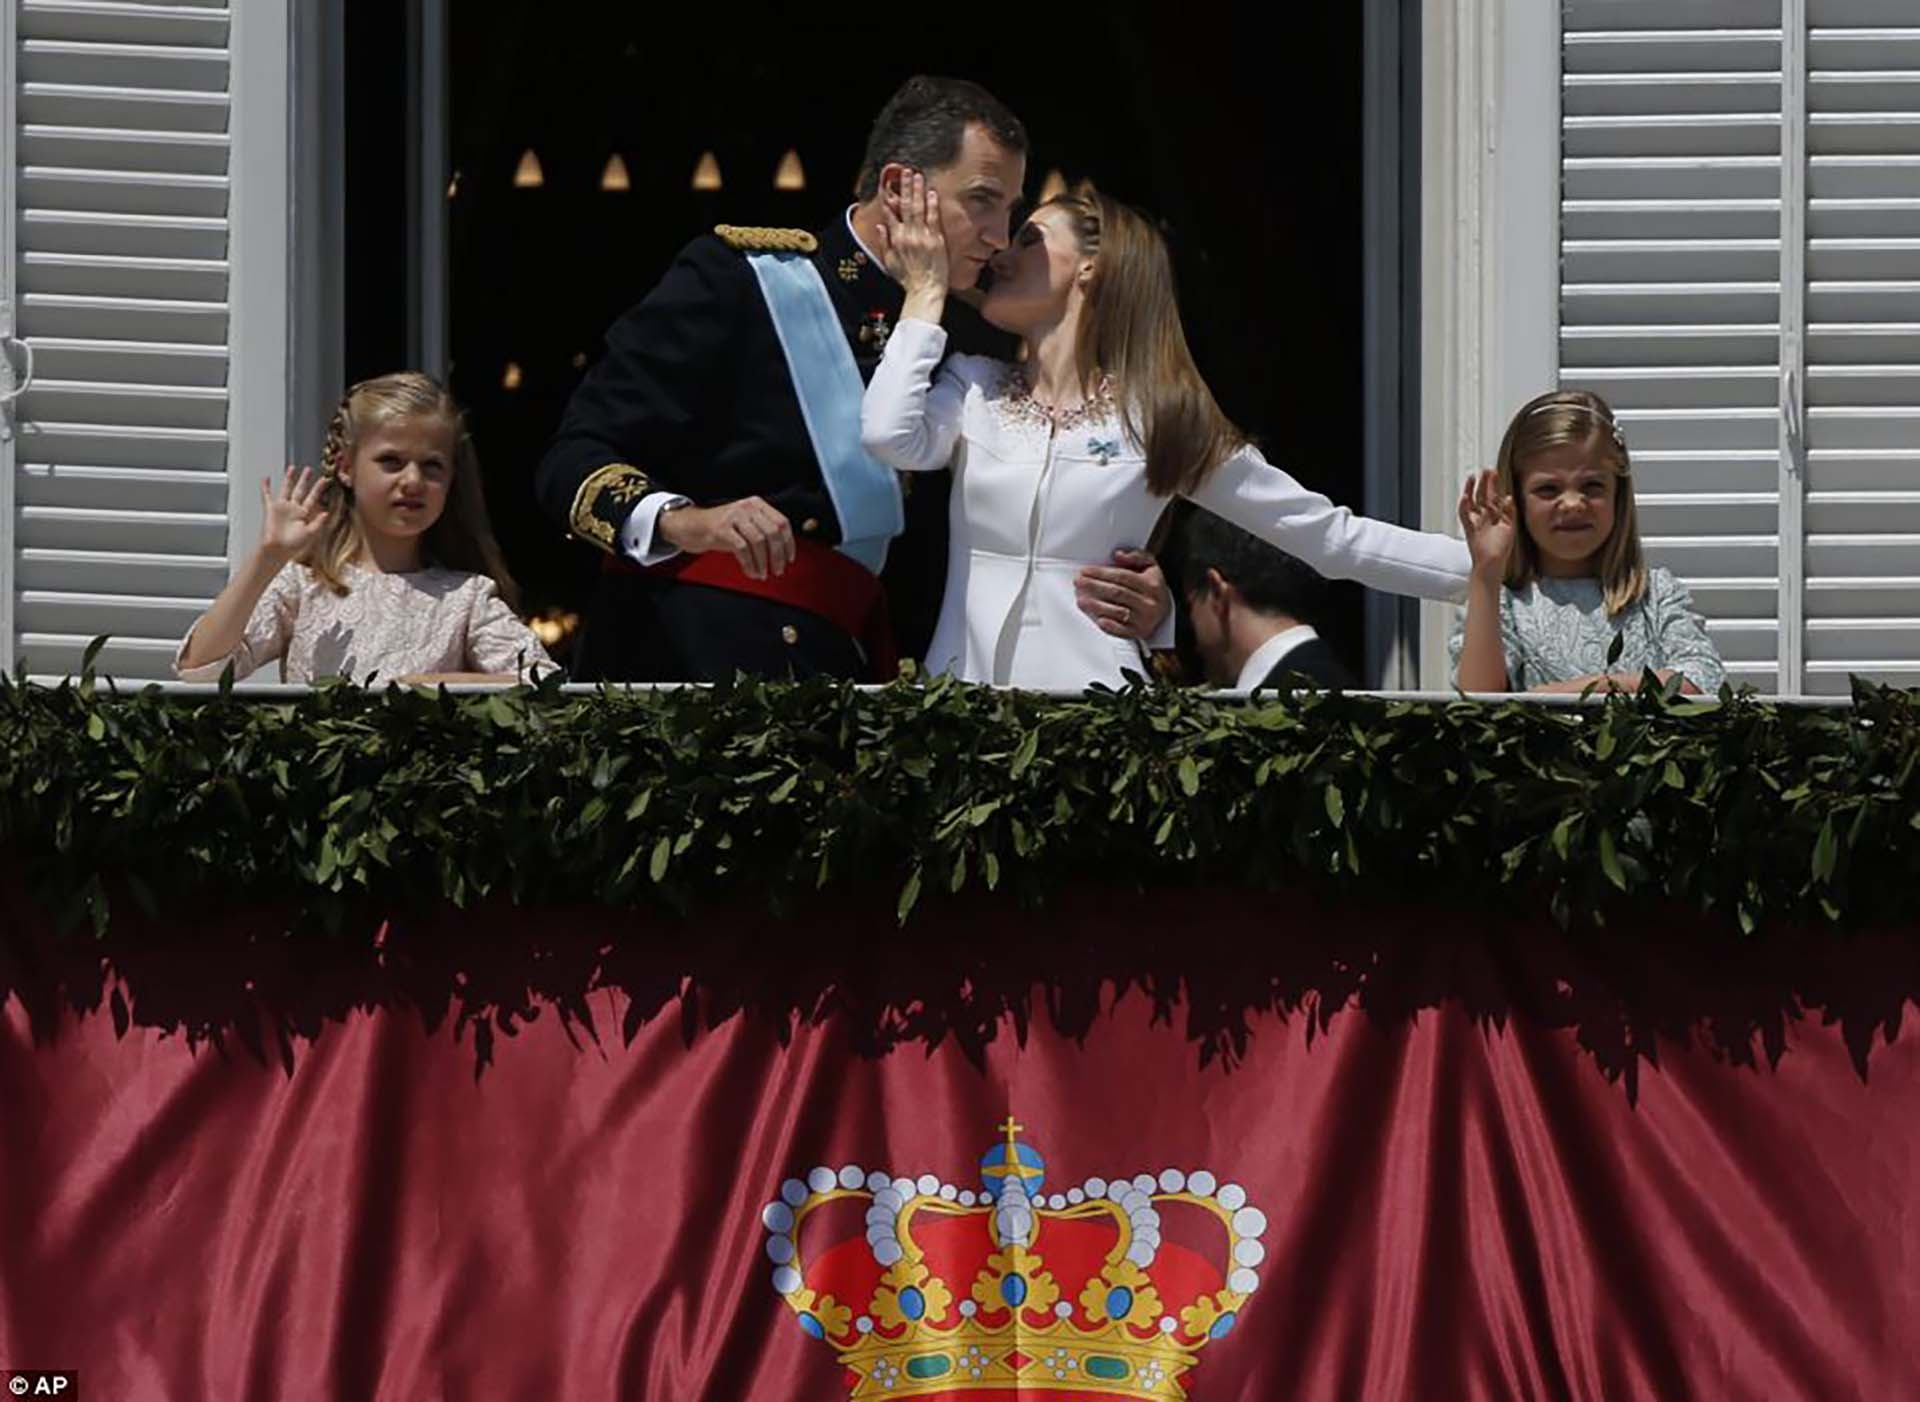 La postal familiar completa, Leonor, la próxima Reina de España y Sofía, princesa.